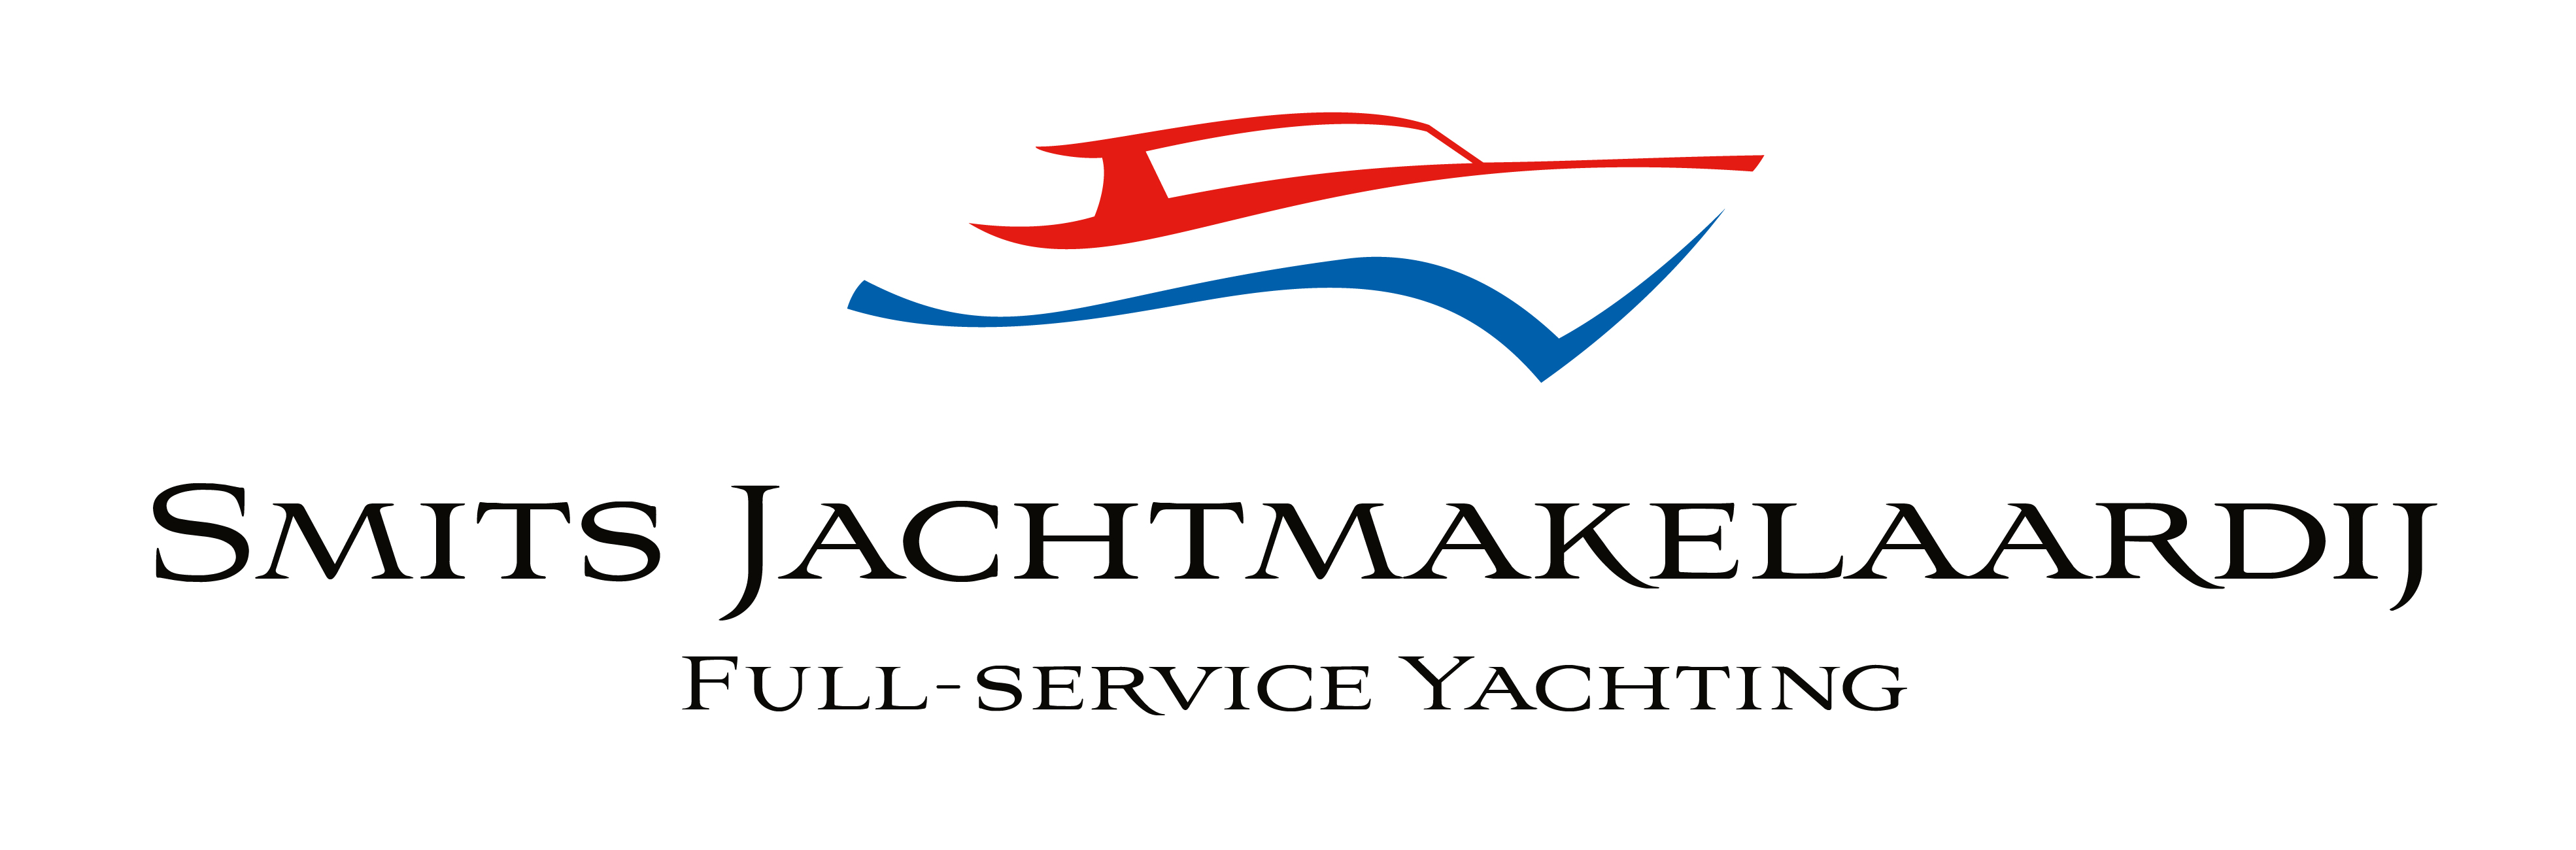 Vedi tutte le imbarcazioni da Smits Jachtmakelaardij